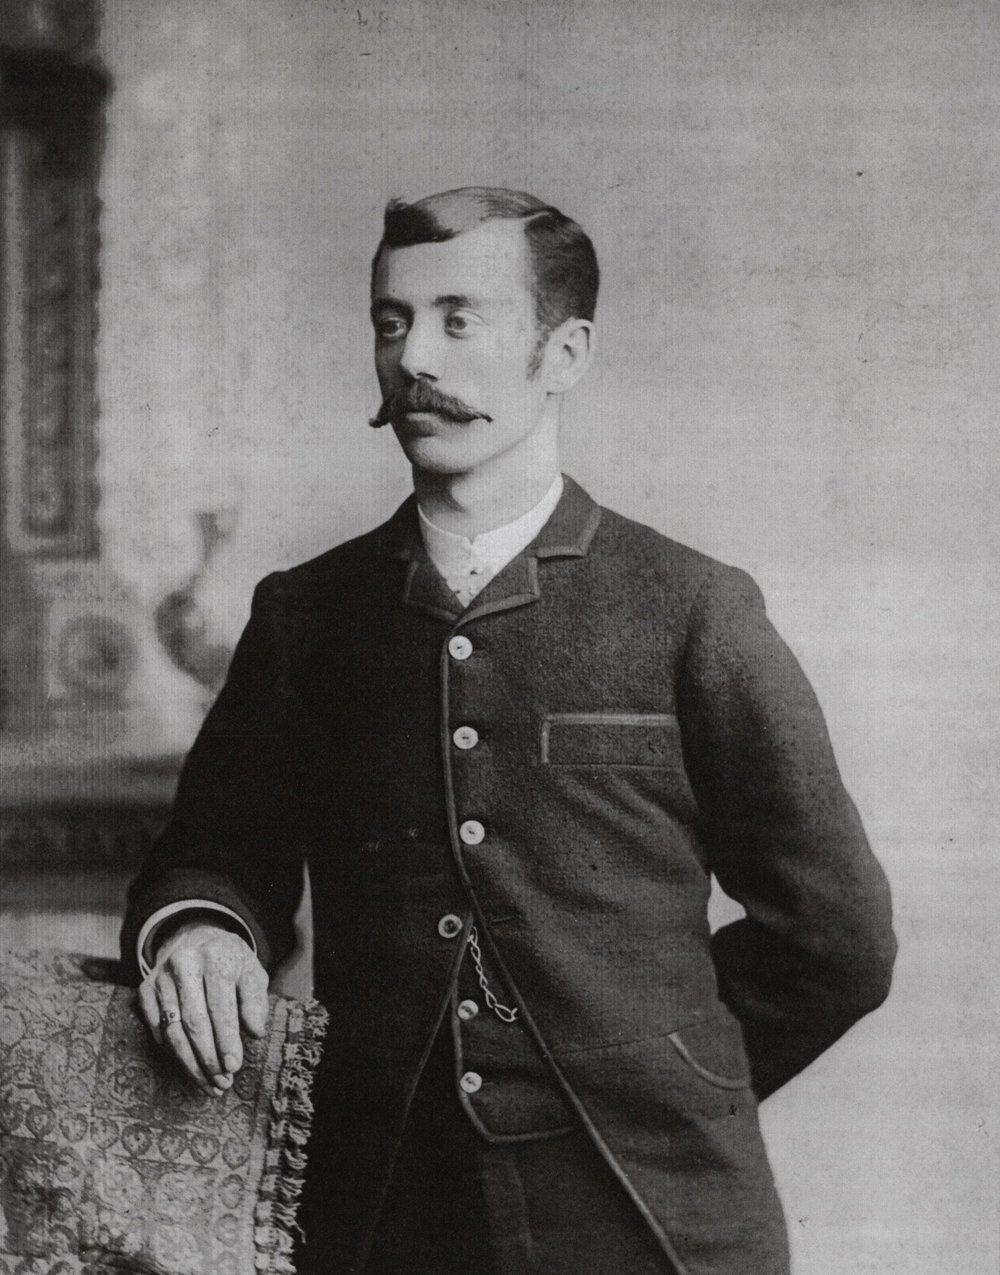 Charles Bleencker 1857-1945